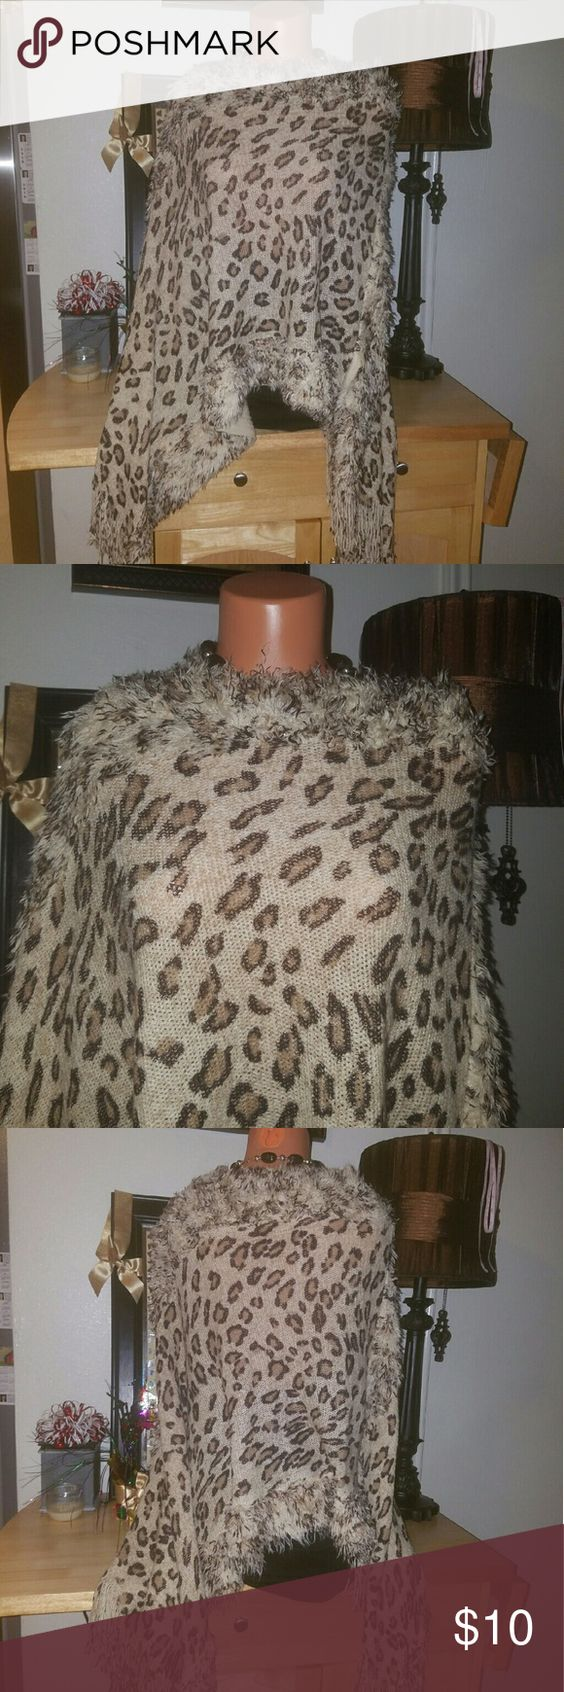 India Boutique poncho. Poncho tiger stile... India Boutique  Jackets & Coats